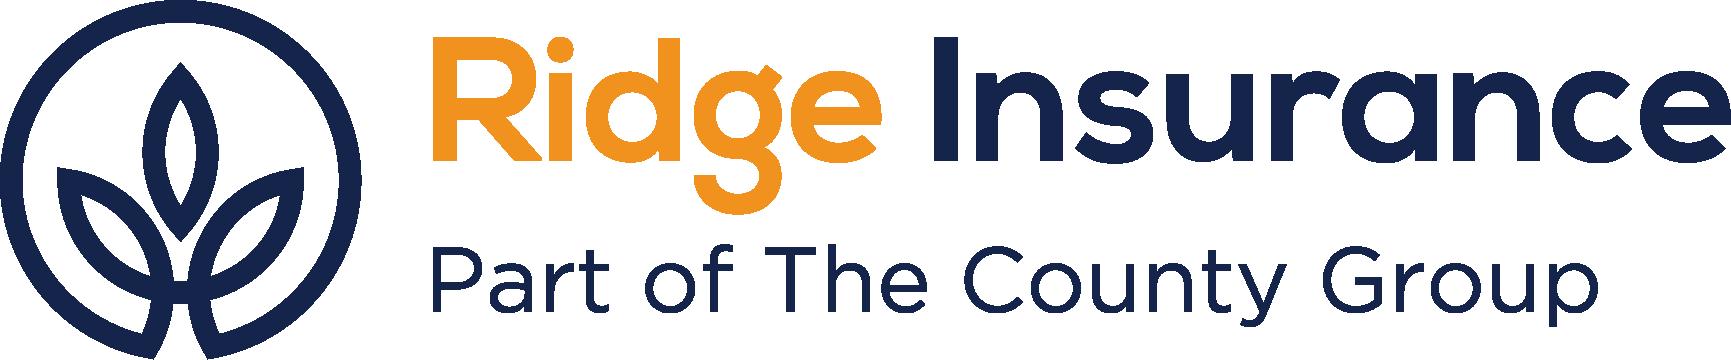 Ridge Insurance